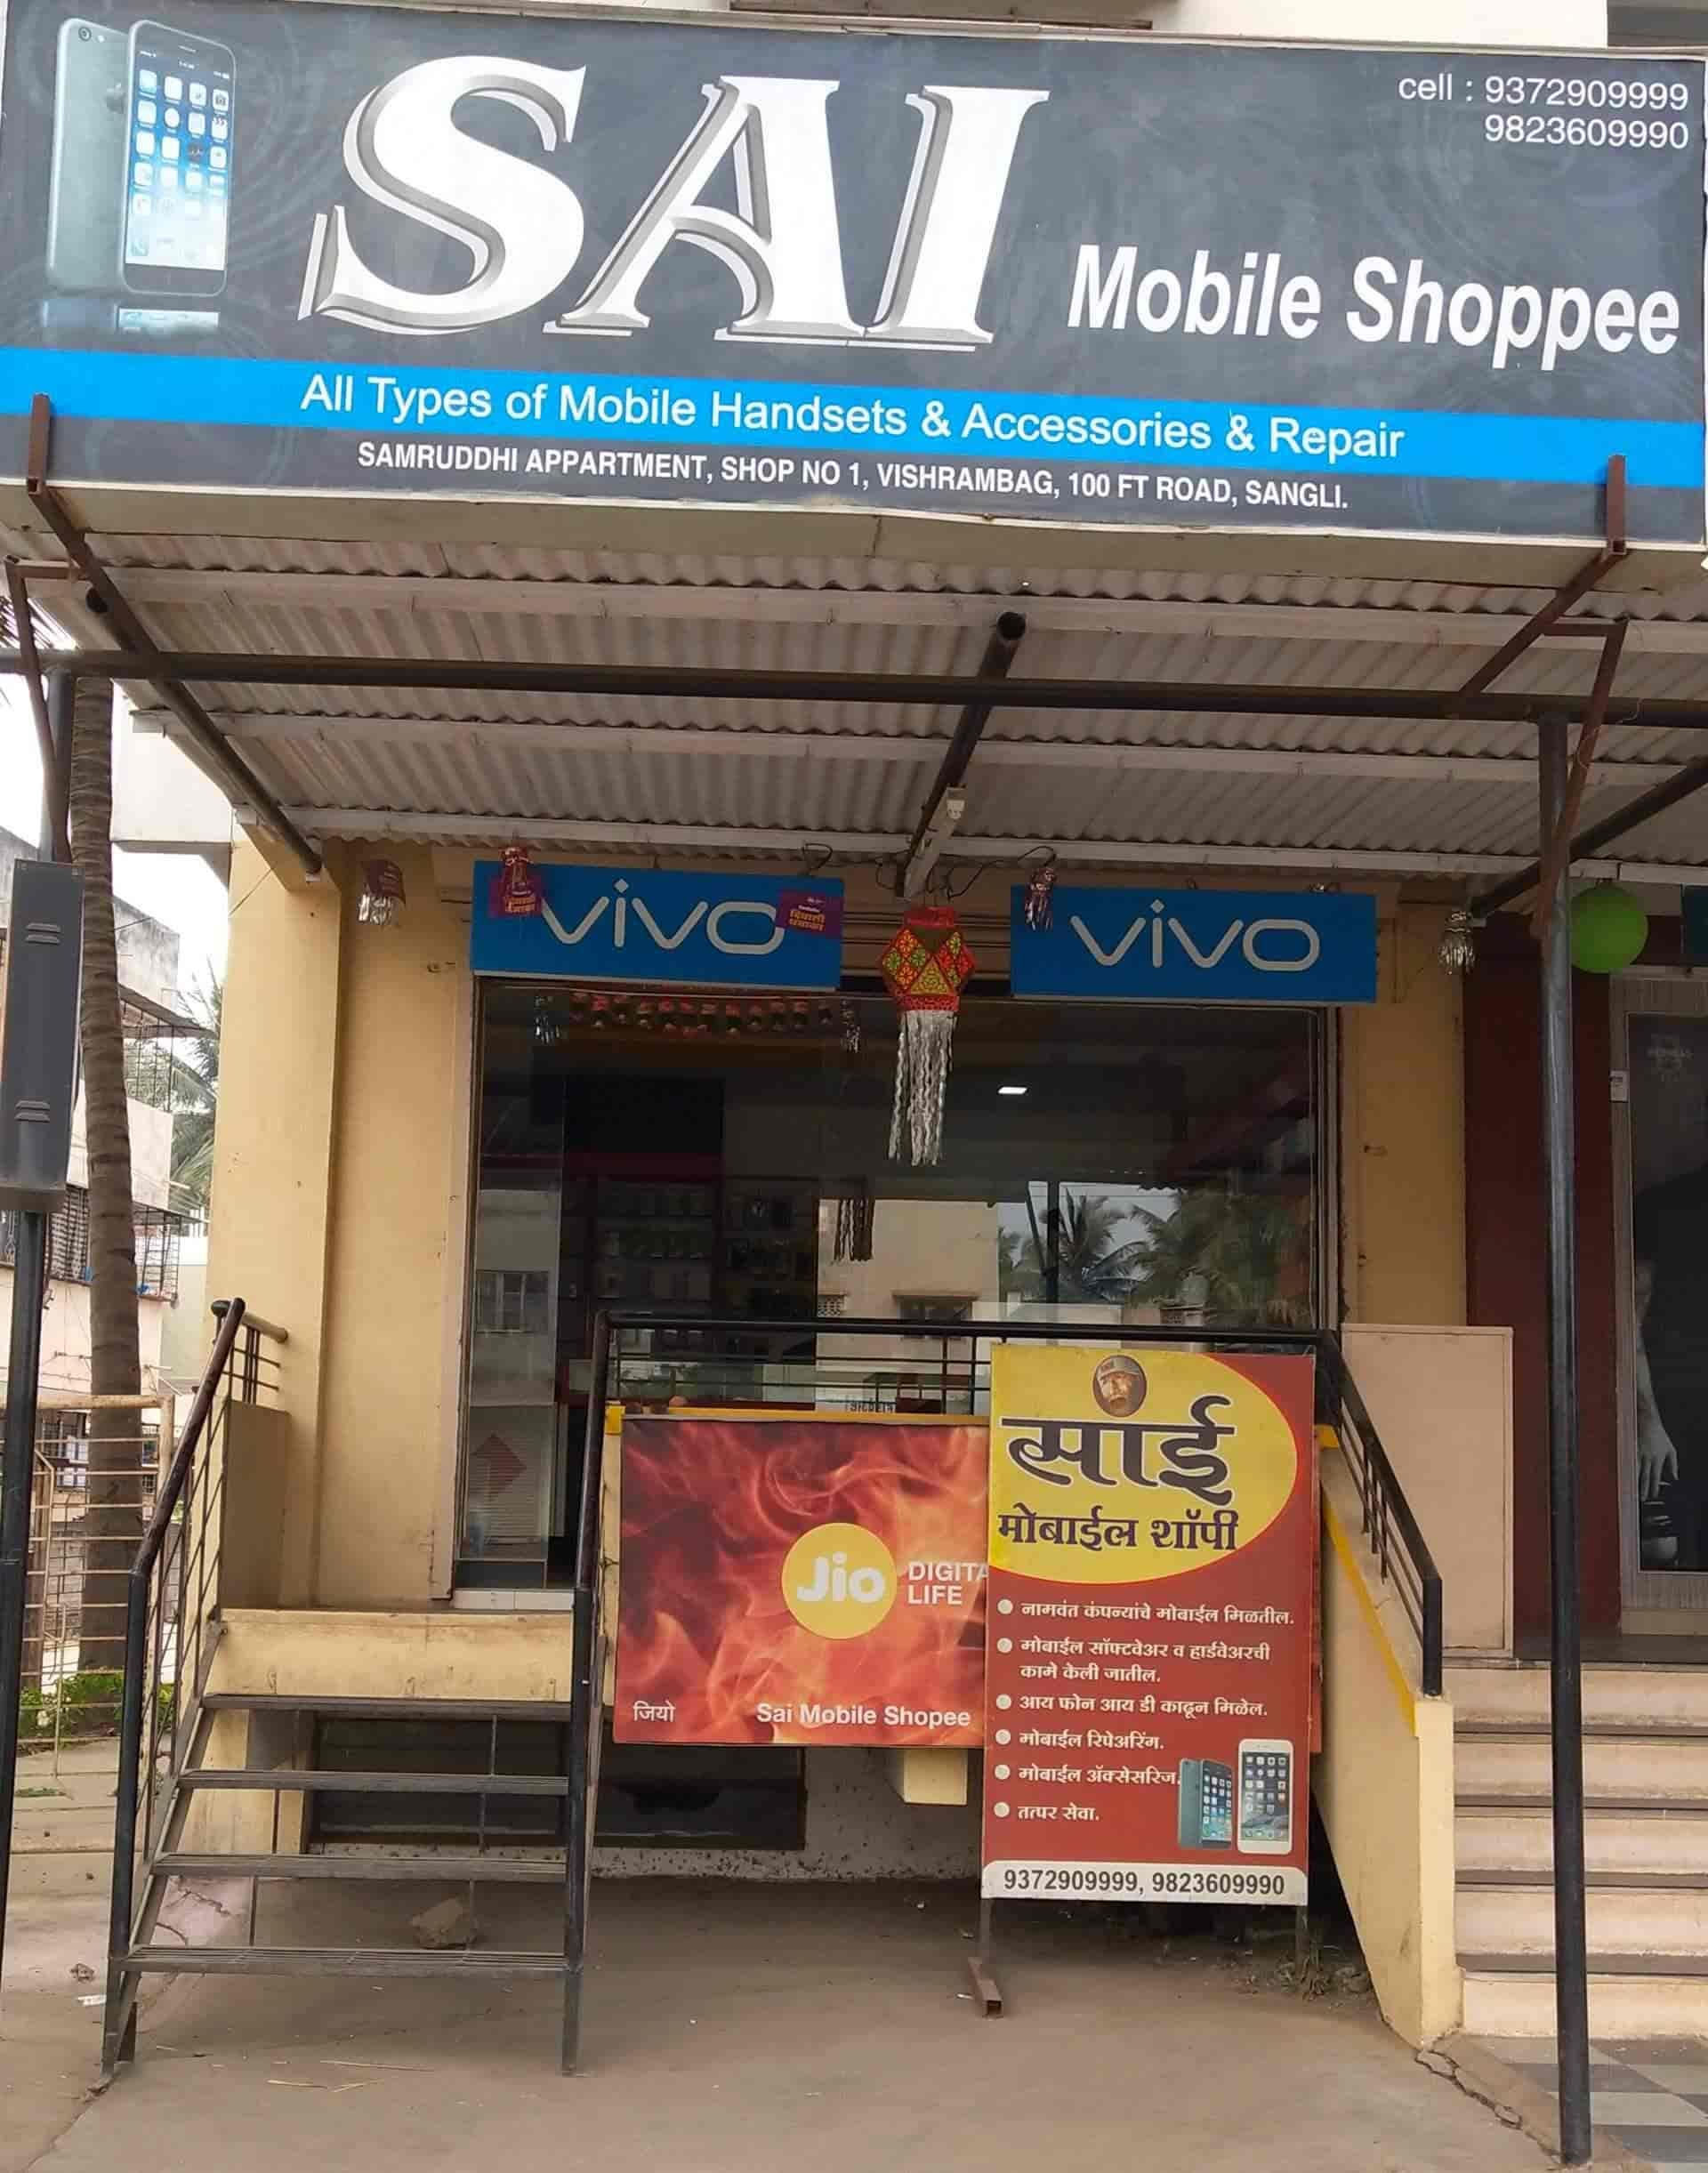 Sai Mobile Shop Photos, Vishrambag, Sangli- Pictures & Images